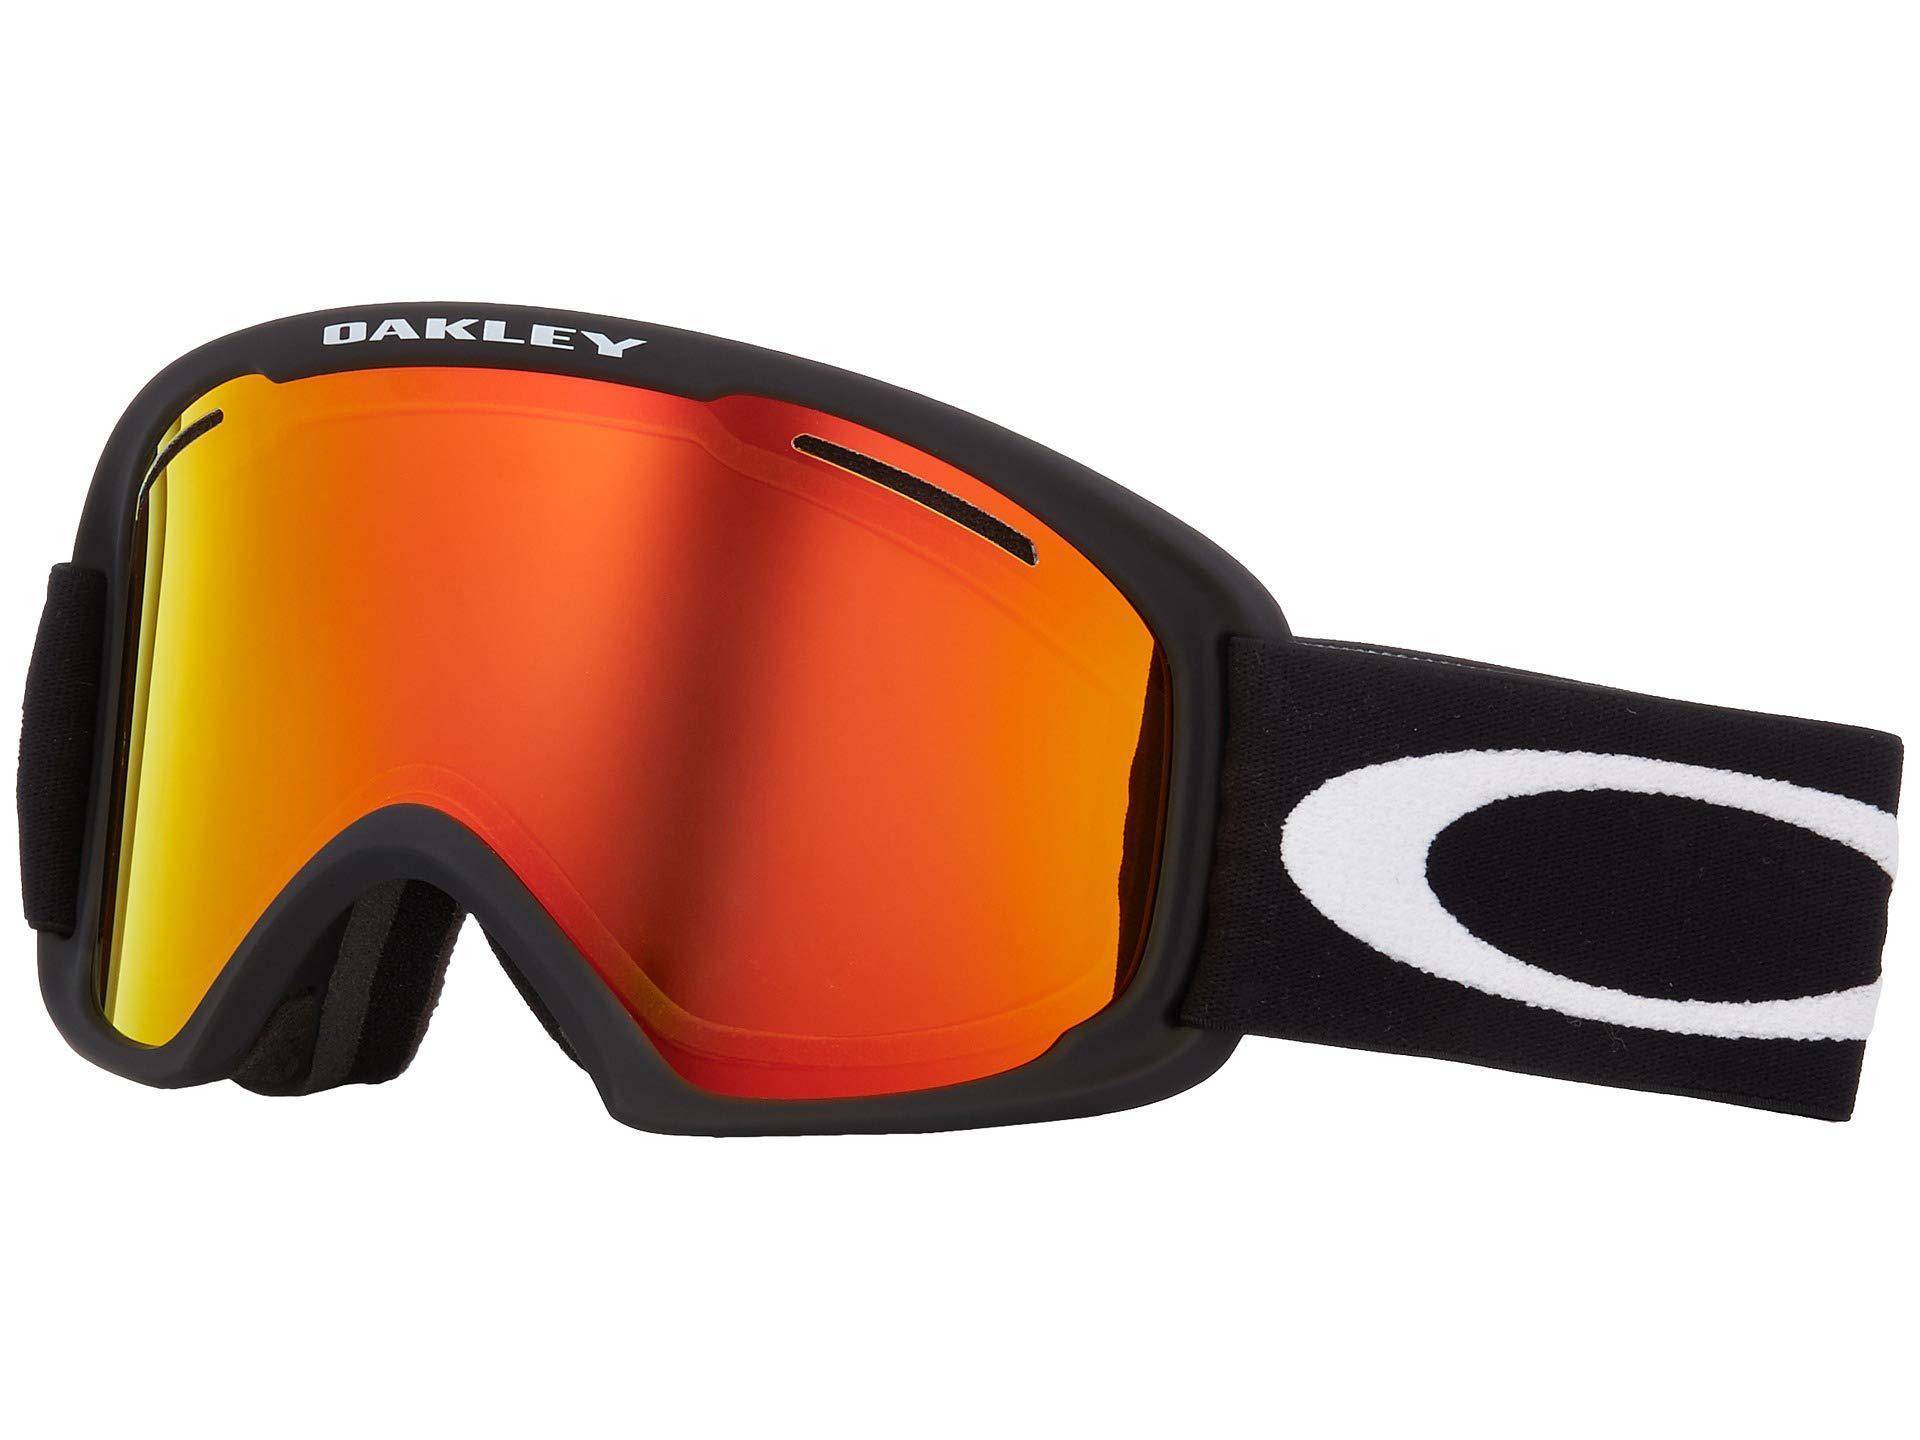 7fe1803c9999 Oakley. Men s O-frame 2.0 Xm (matte Black W  Persimmon dark Grey) Snow  Goggles